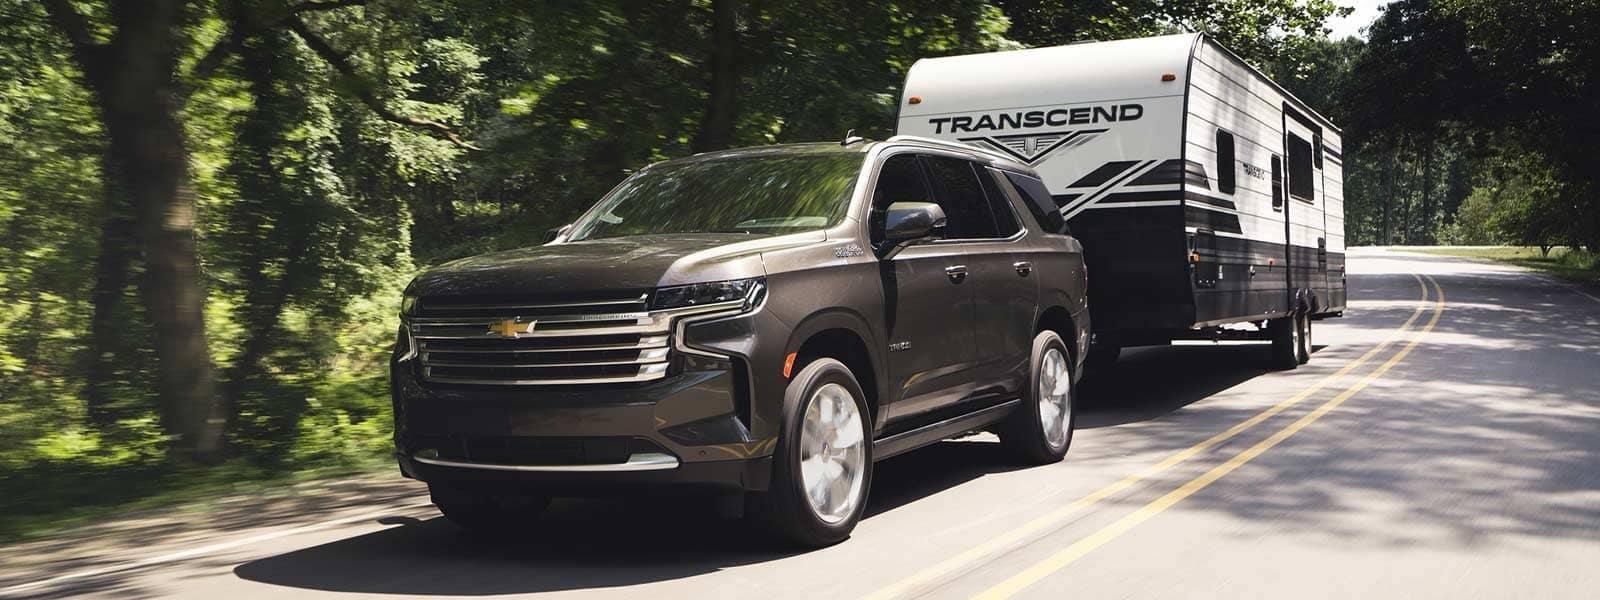 Buy 2021 Chevrolet Tahoe in Sudbury Ontario